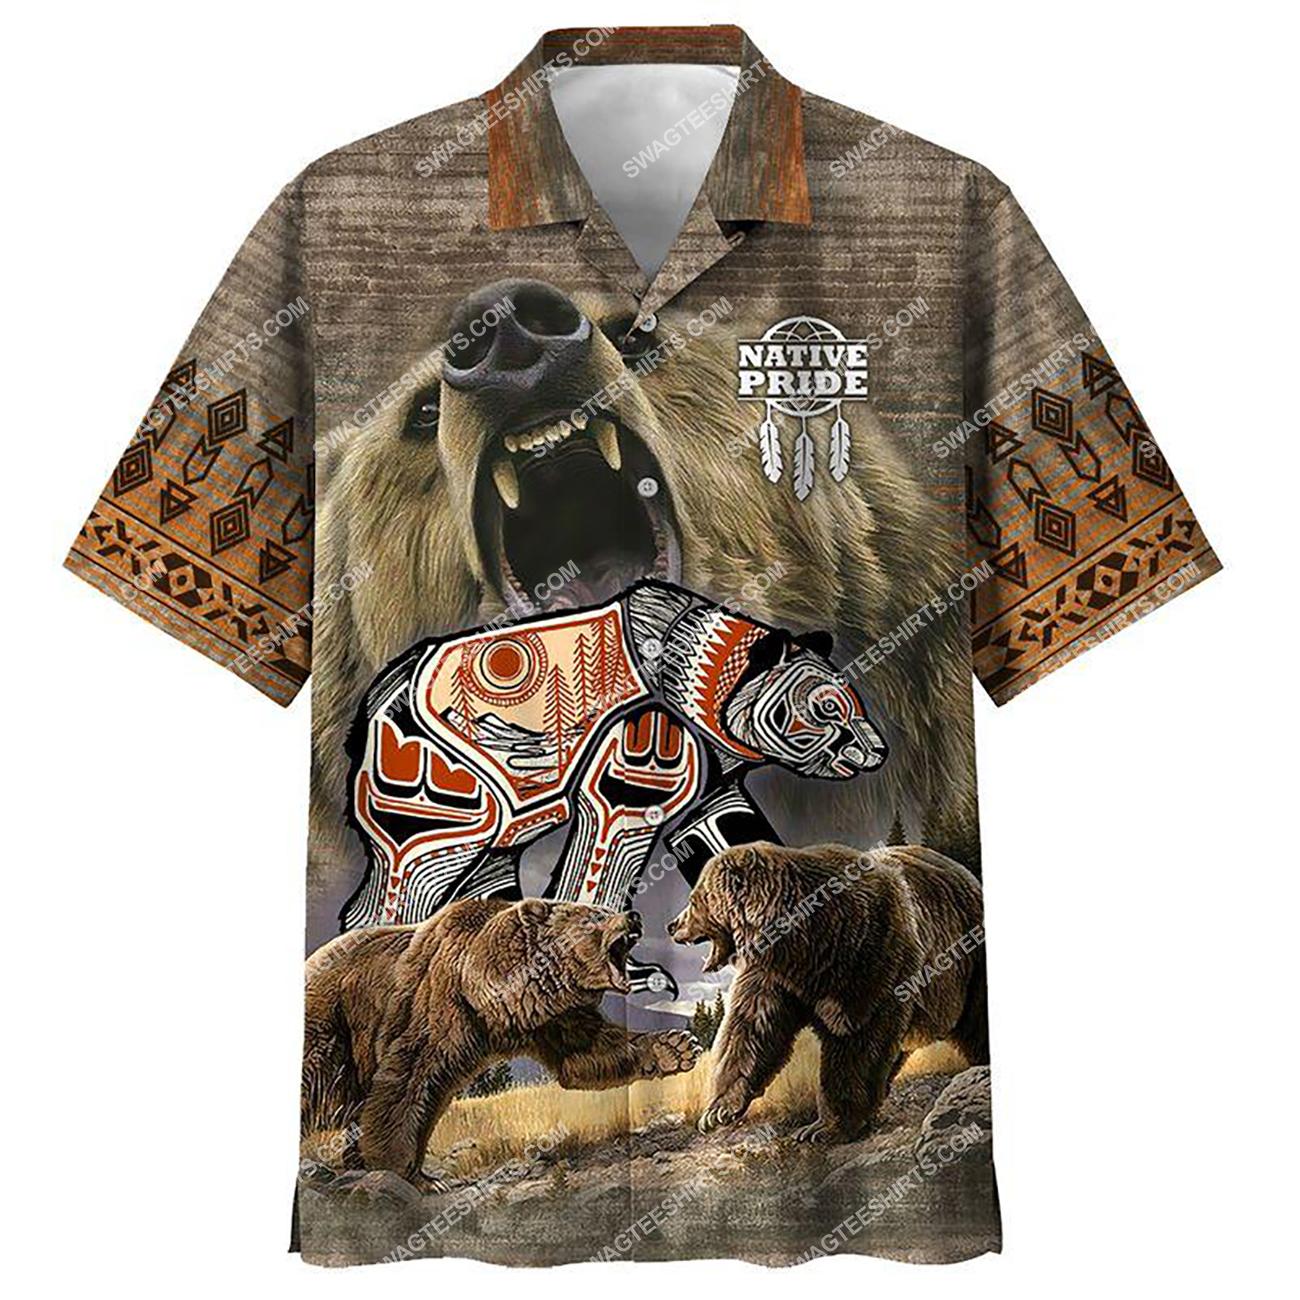 vintage native american native pride all over printed hawaiian shirt 1(2) - Copy